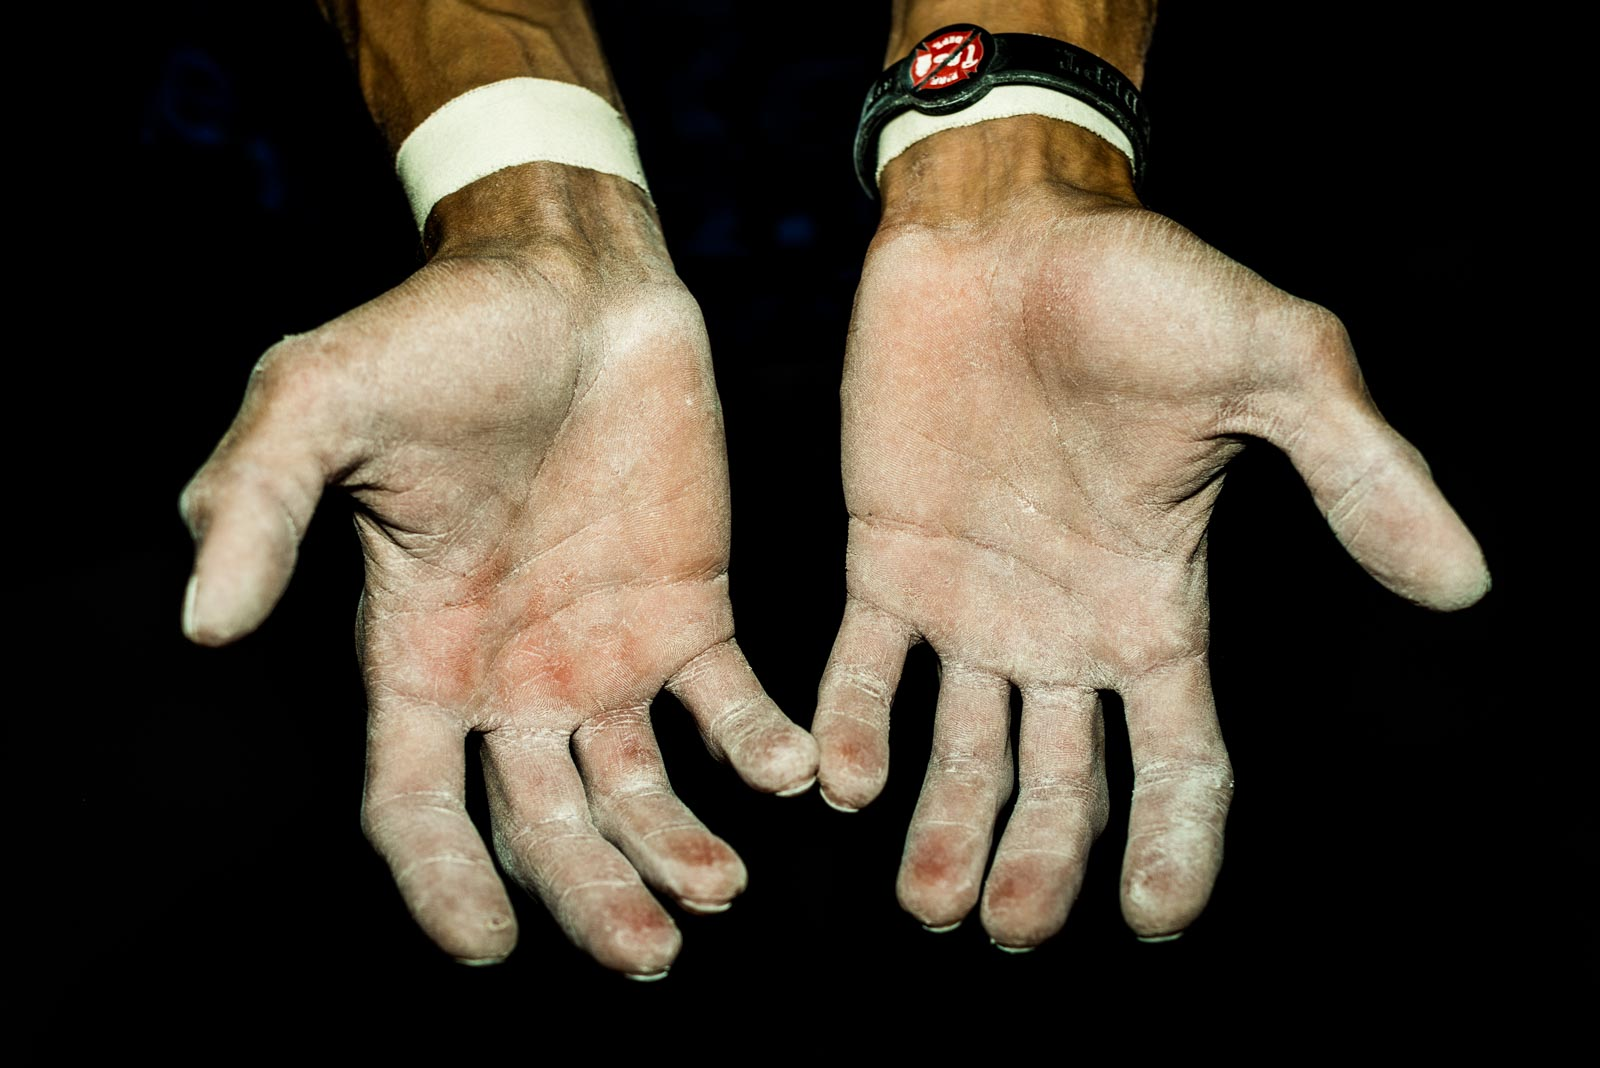 Hands of climber Rustam Gelmanov from Russia